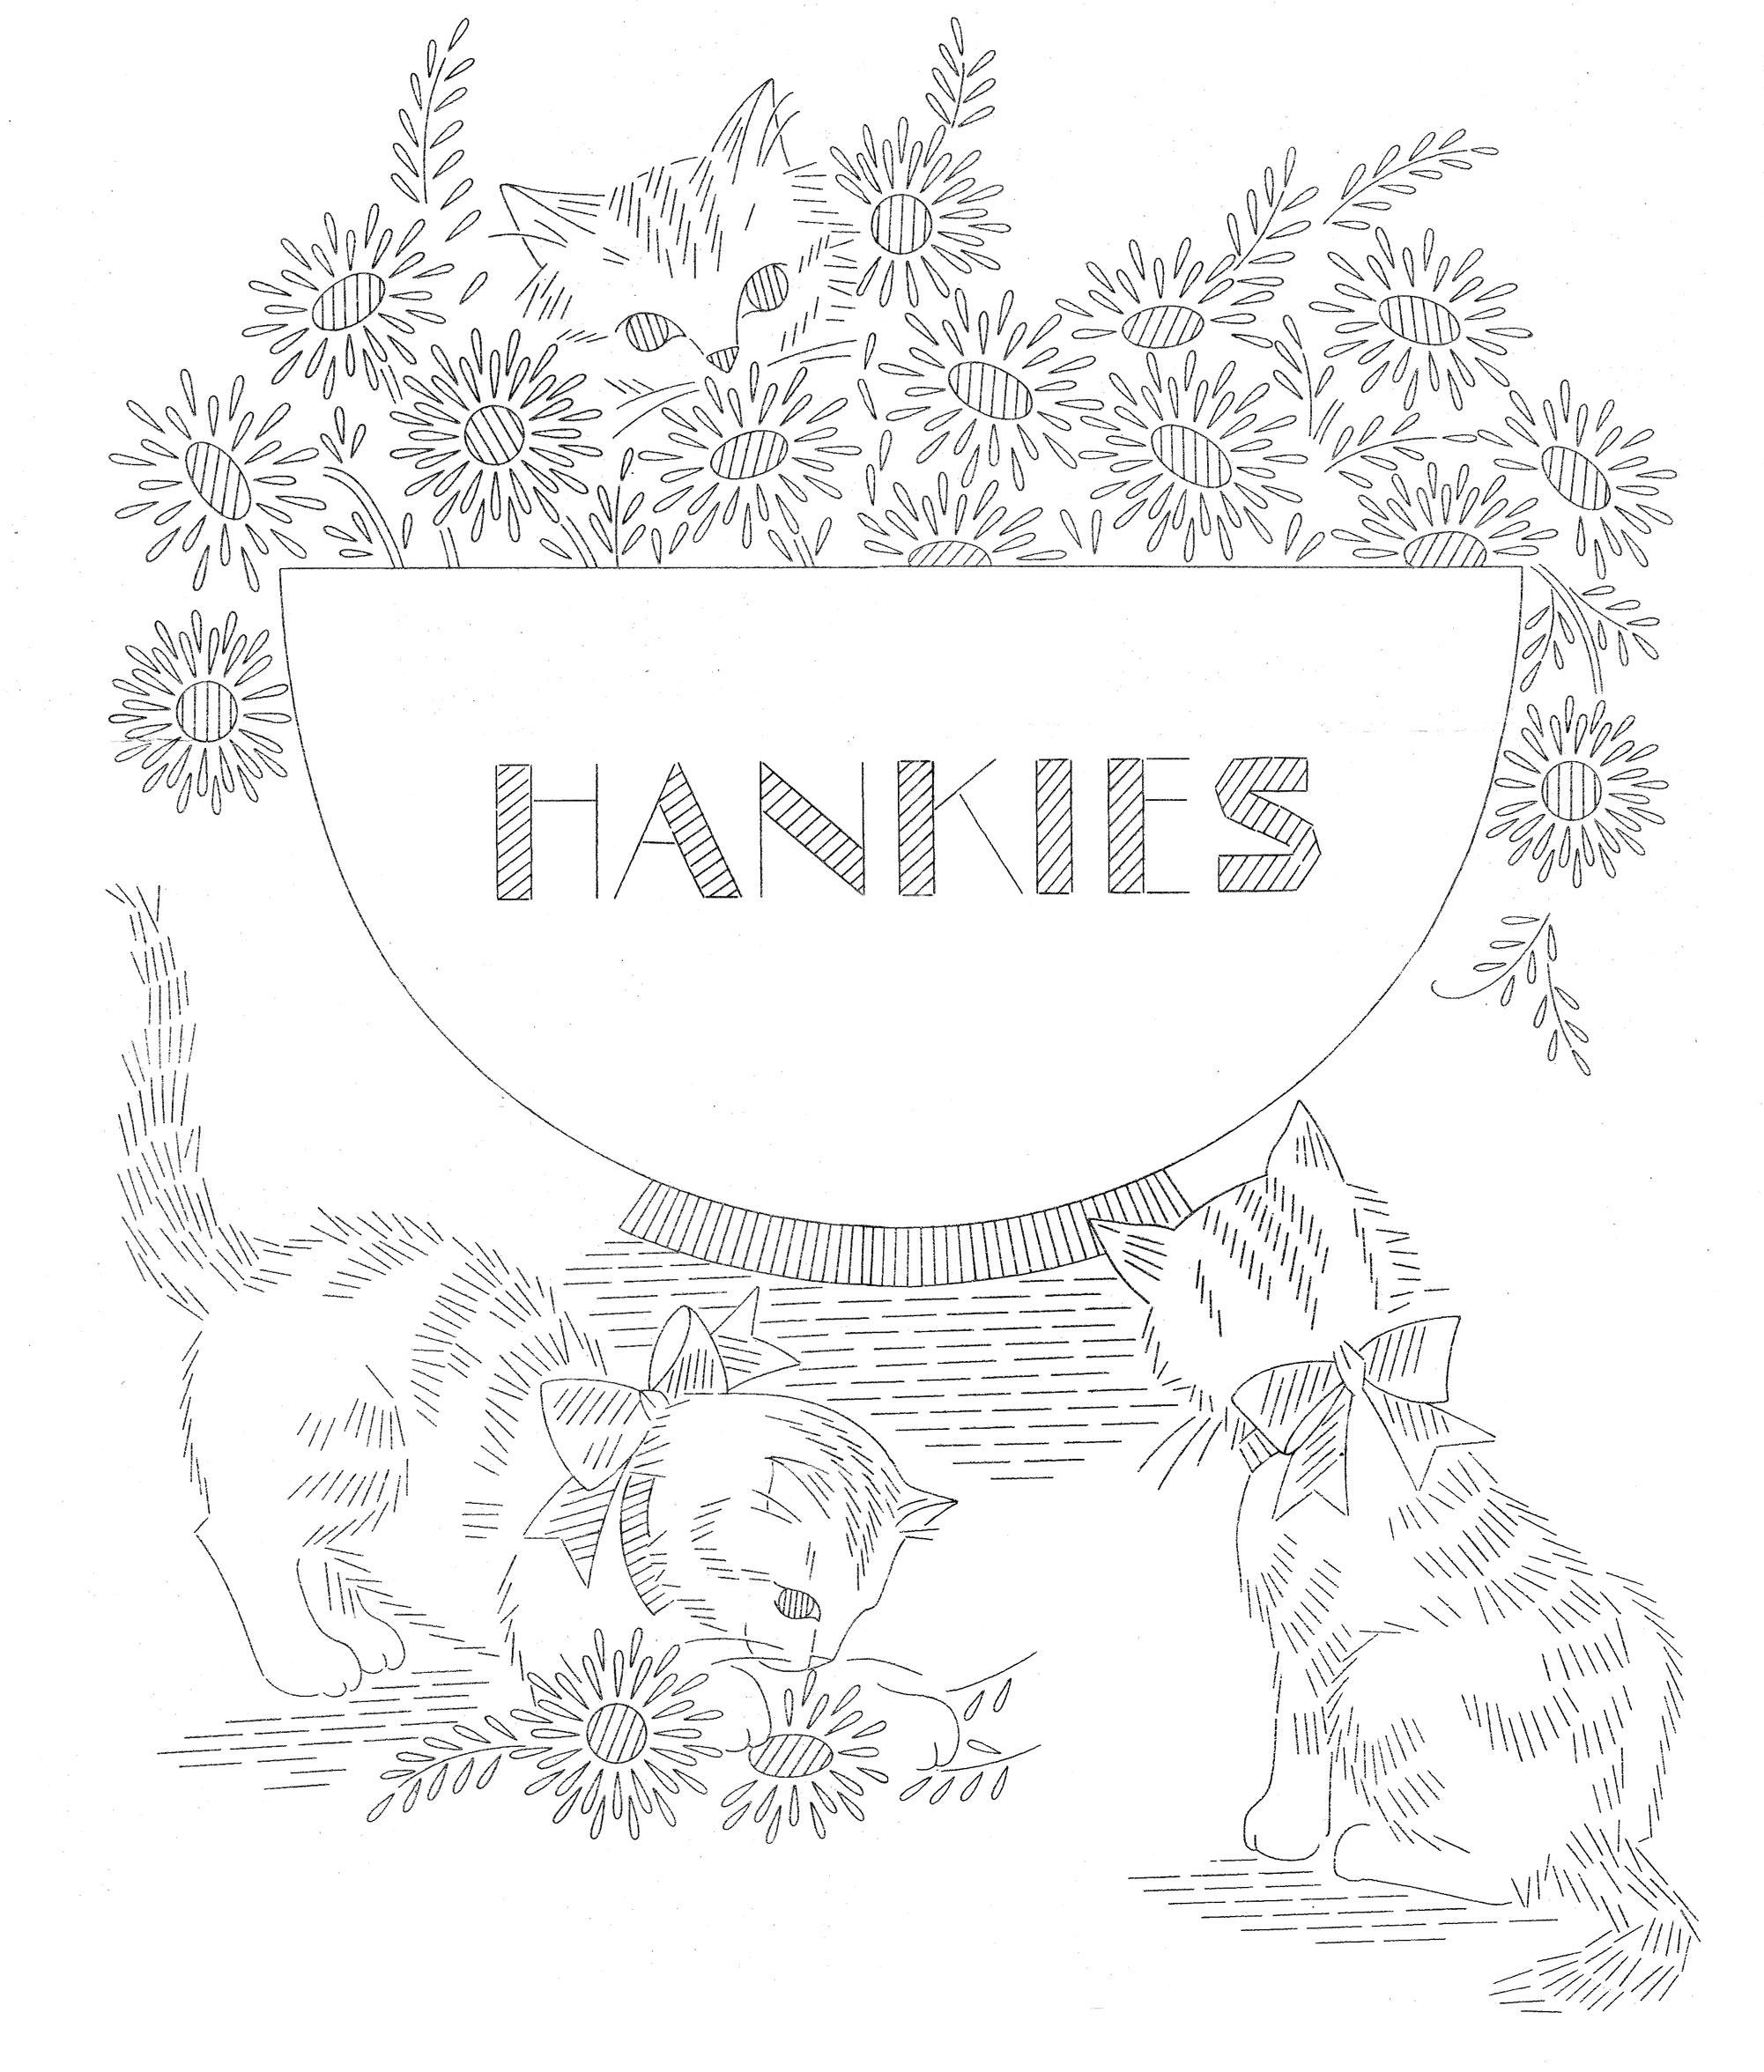 http://qisforquilter.com/wp-content/uploads/2010/03/hankies.jpg